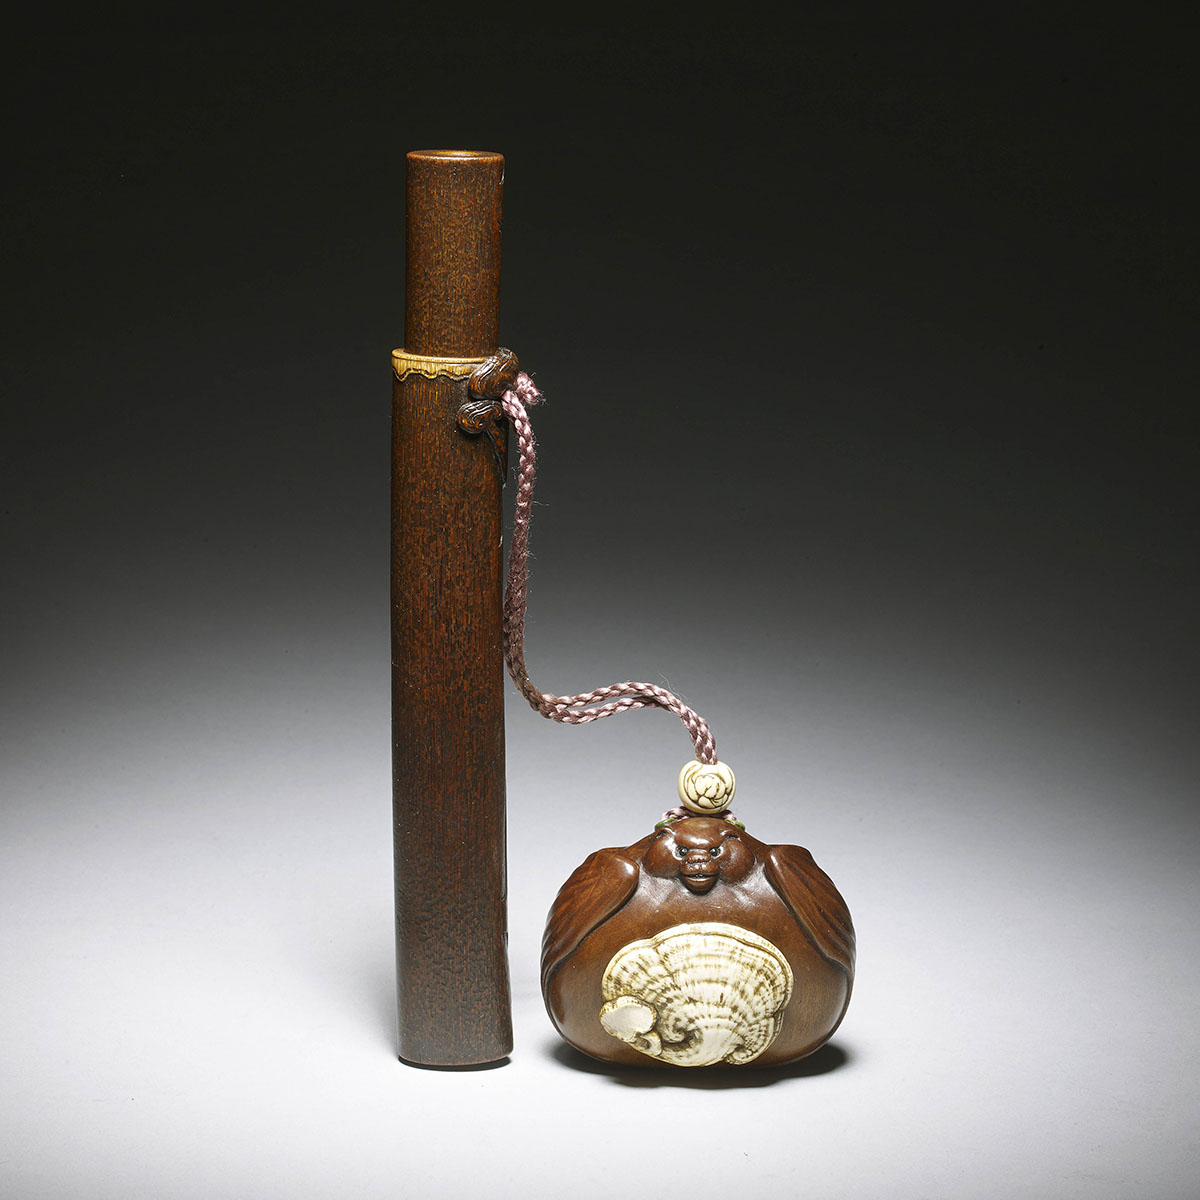 Asahi Meido, Fruitwood tonkotsu in the form of a bat MR1994_v1-2